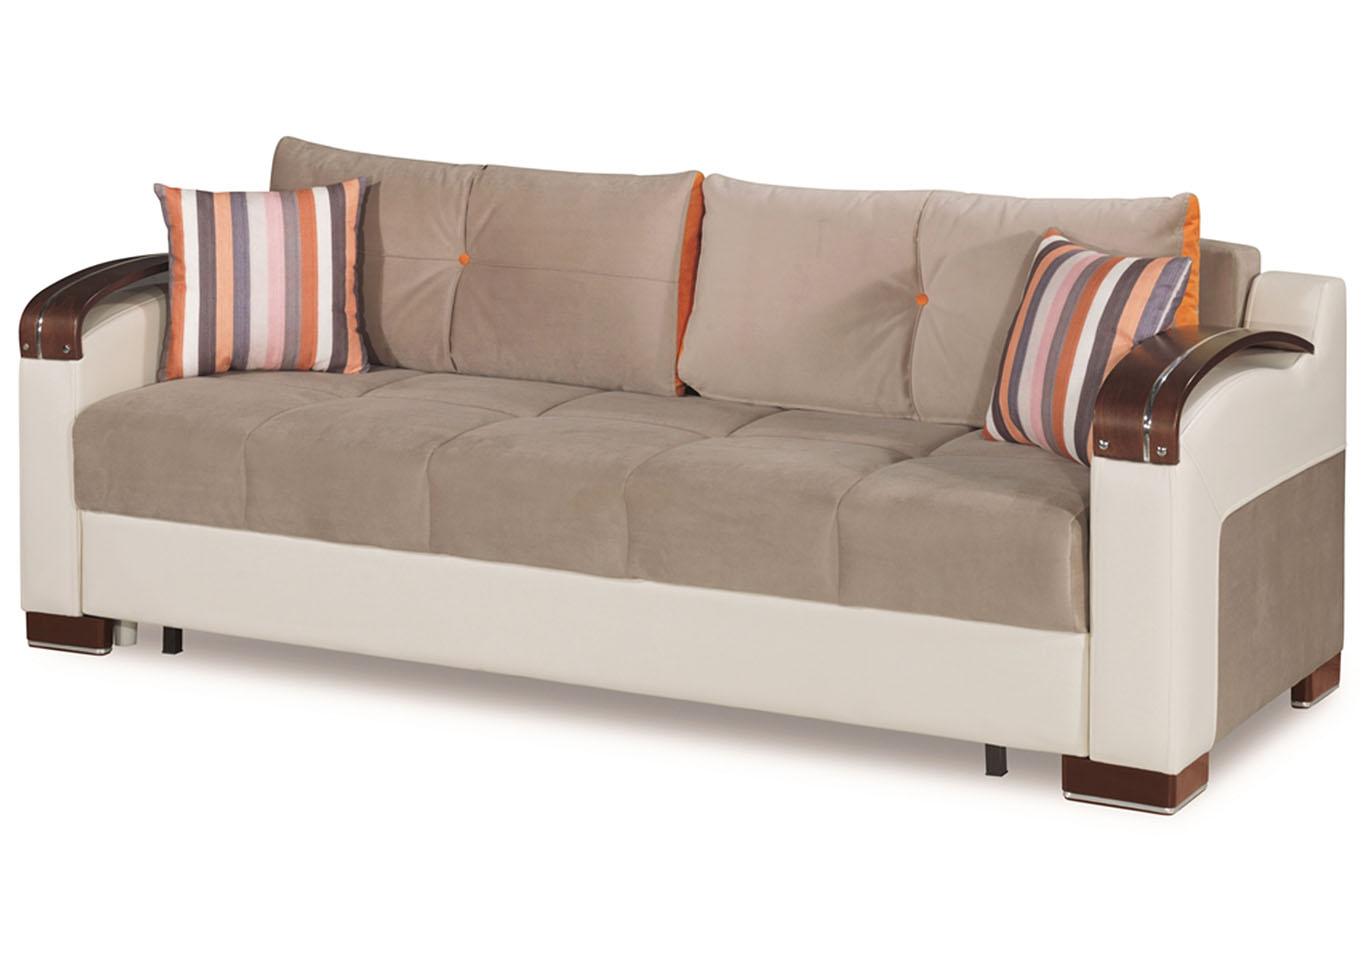 divan deluxe gray microfiber sofa u and u home budget furniture